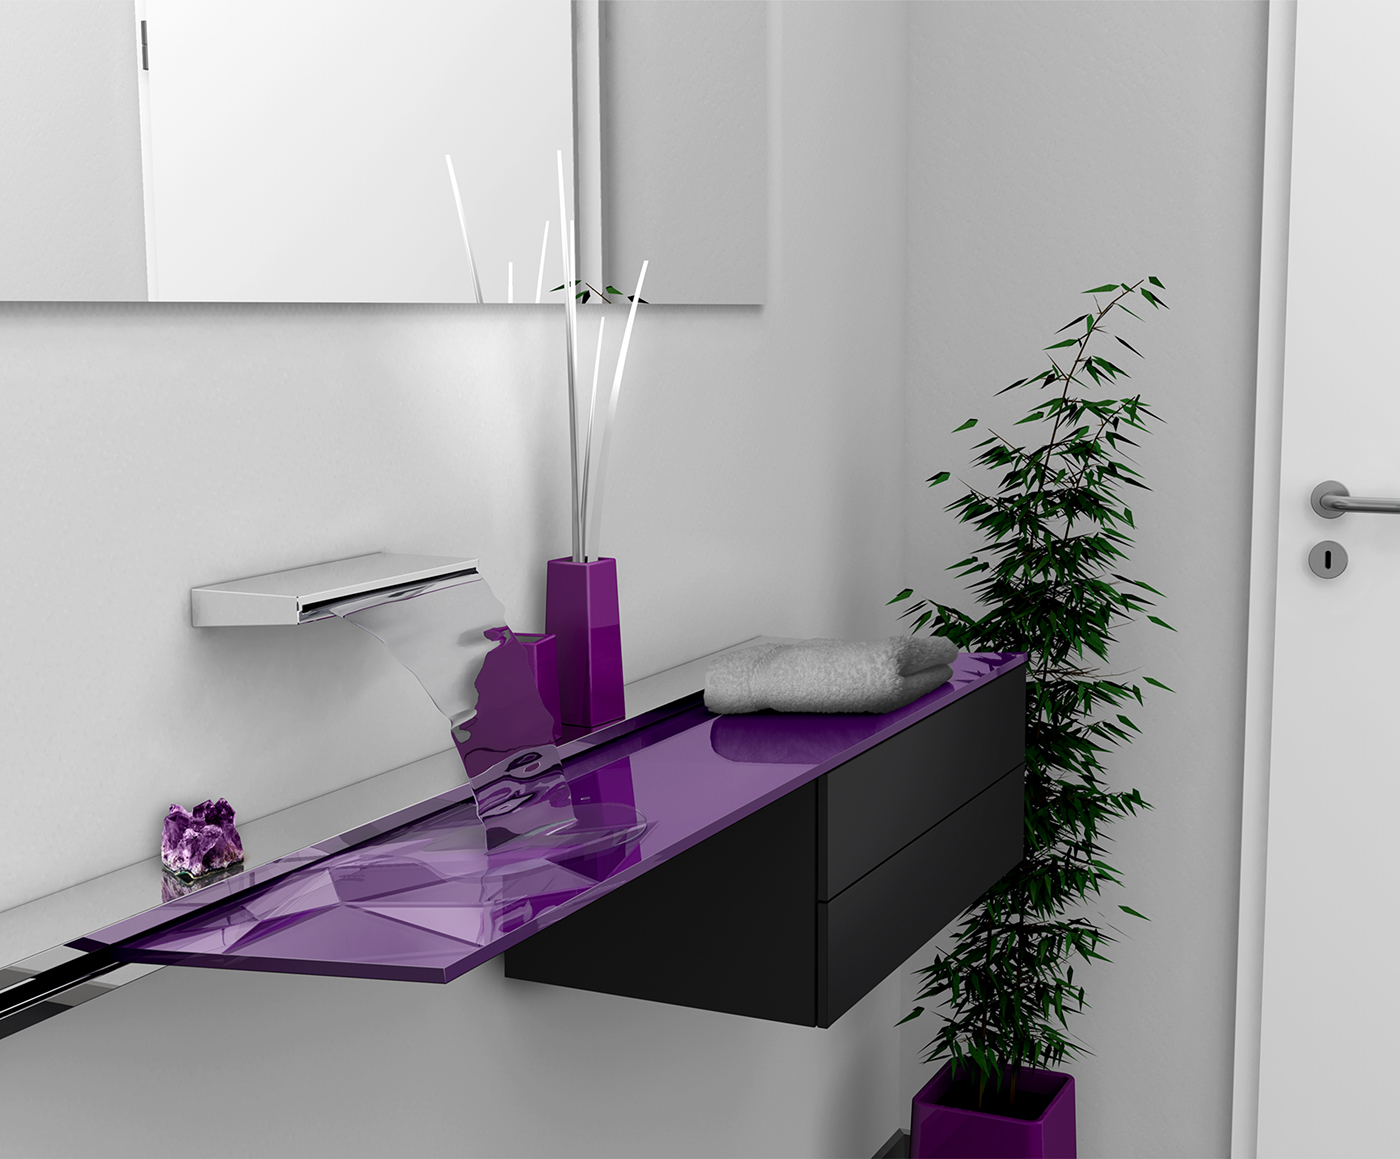 Sink bathroom rail Board water TAP aluminum aluminium Extrusion minimal metal glass stone relief structure